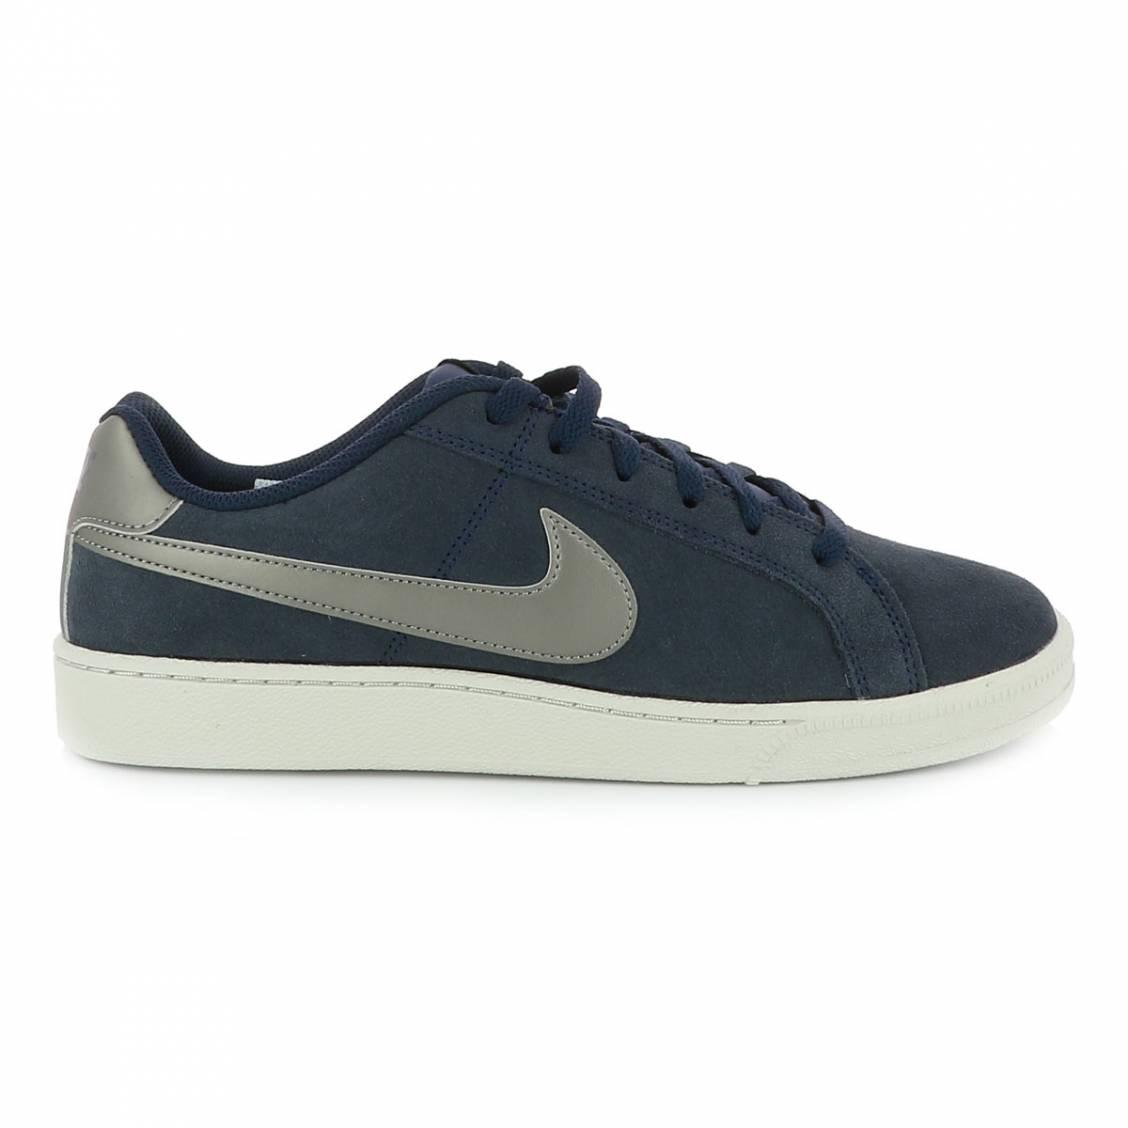 newest 849a7 9d93d Baskets Nike Court Royale bleu marine ...